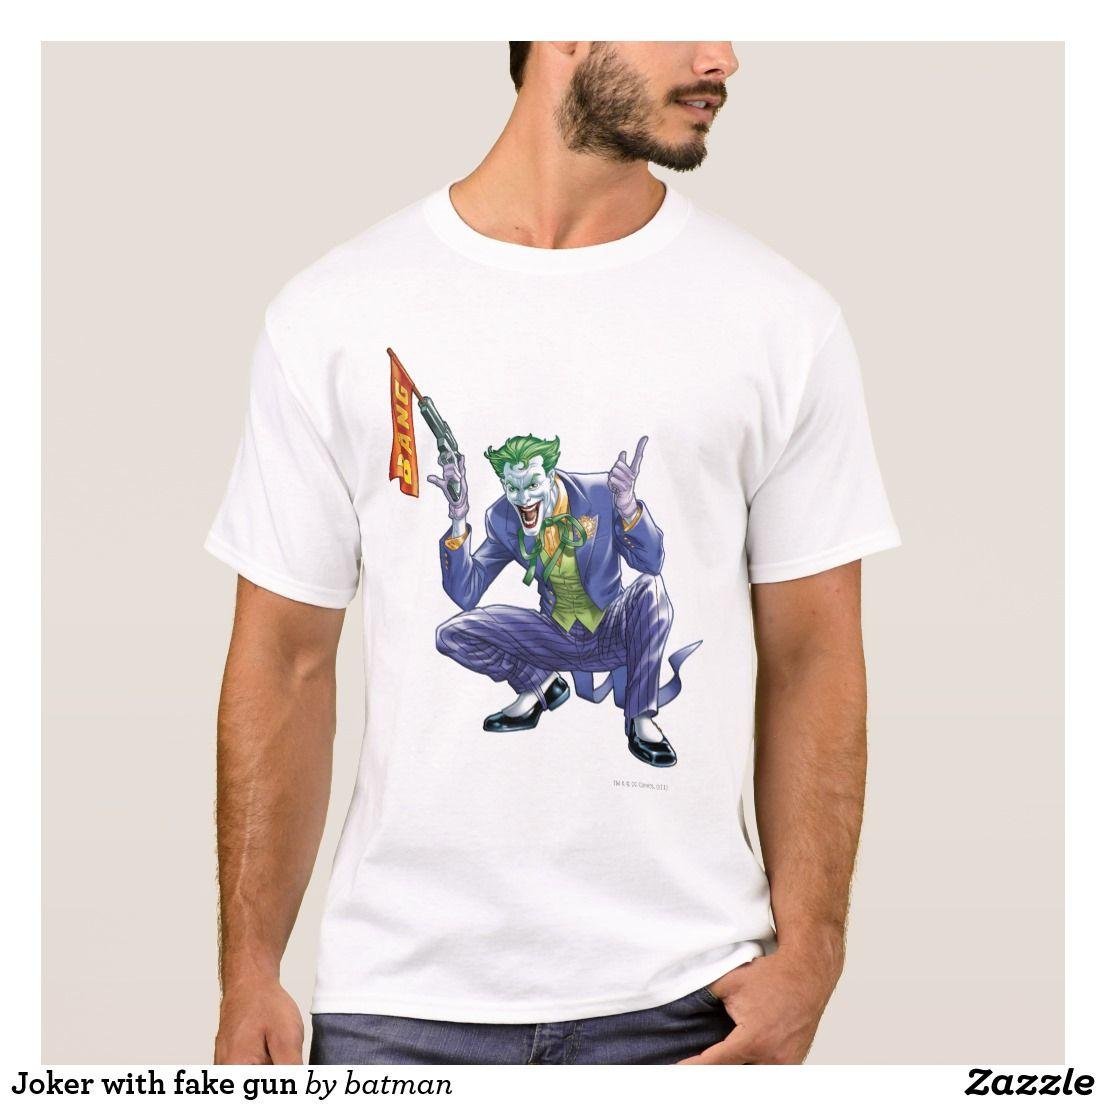 5c66d304c Joker With Fake Gun T-Shirt #JokerClothing #JokerGifts #JokerGiftIdeas  #JokerFan Batman